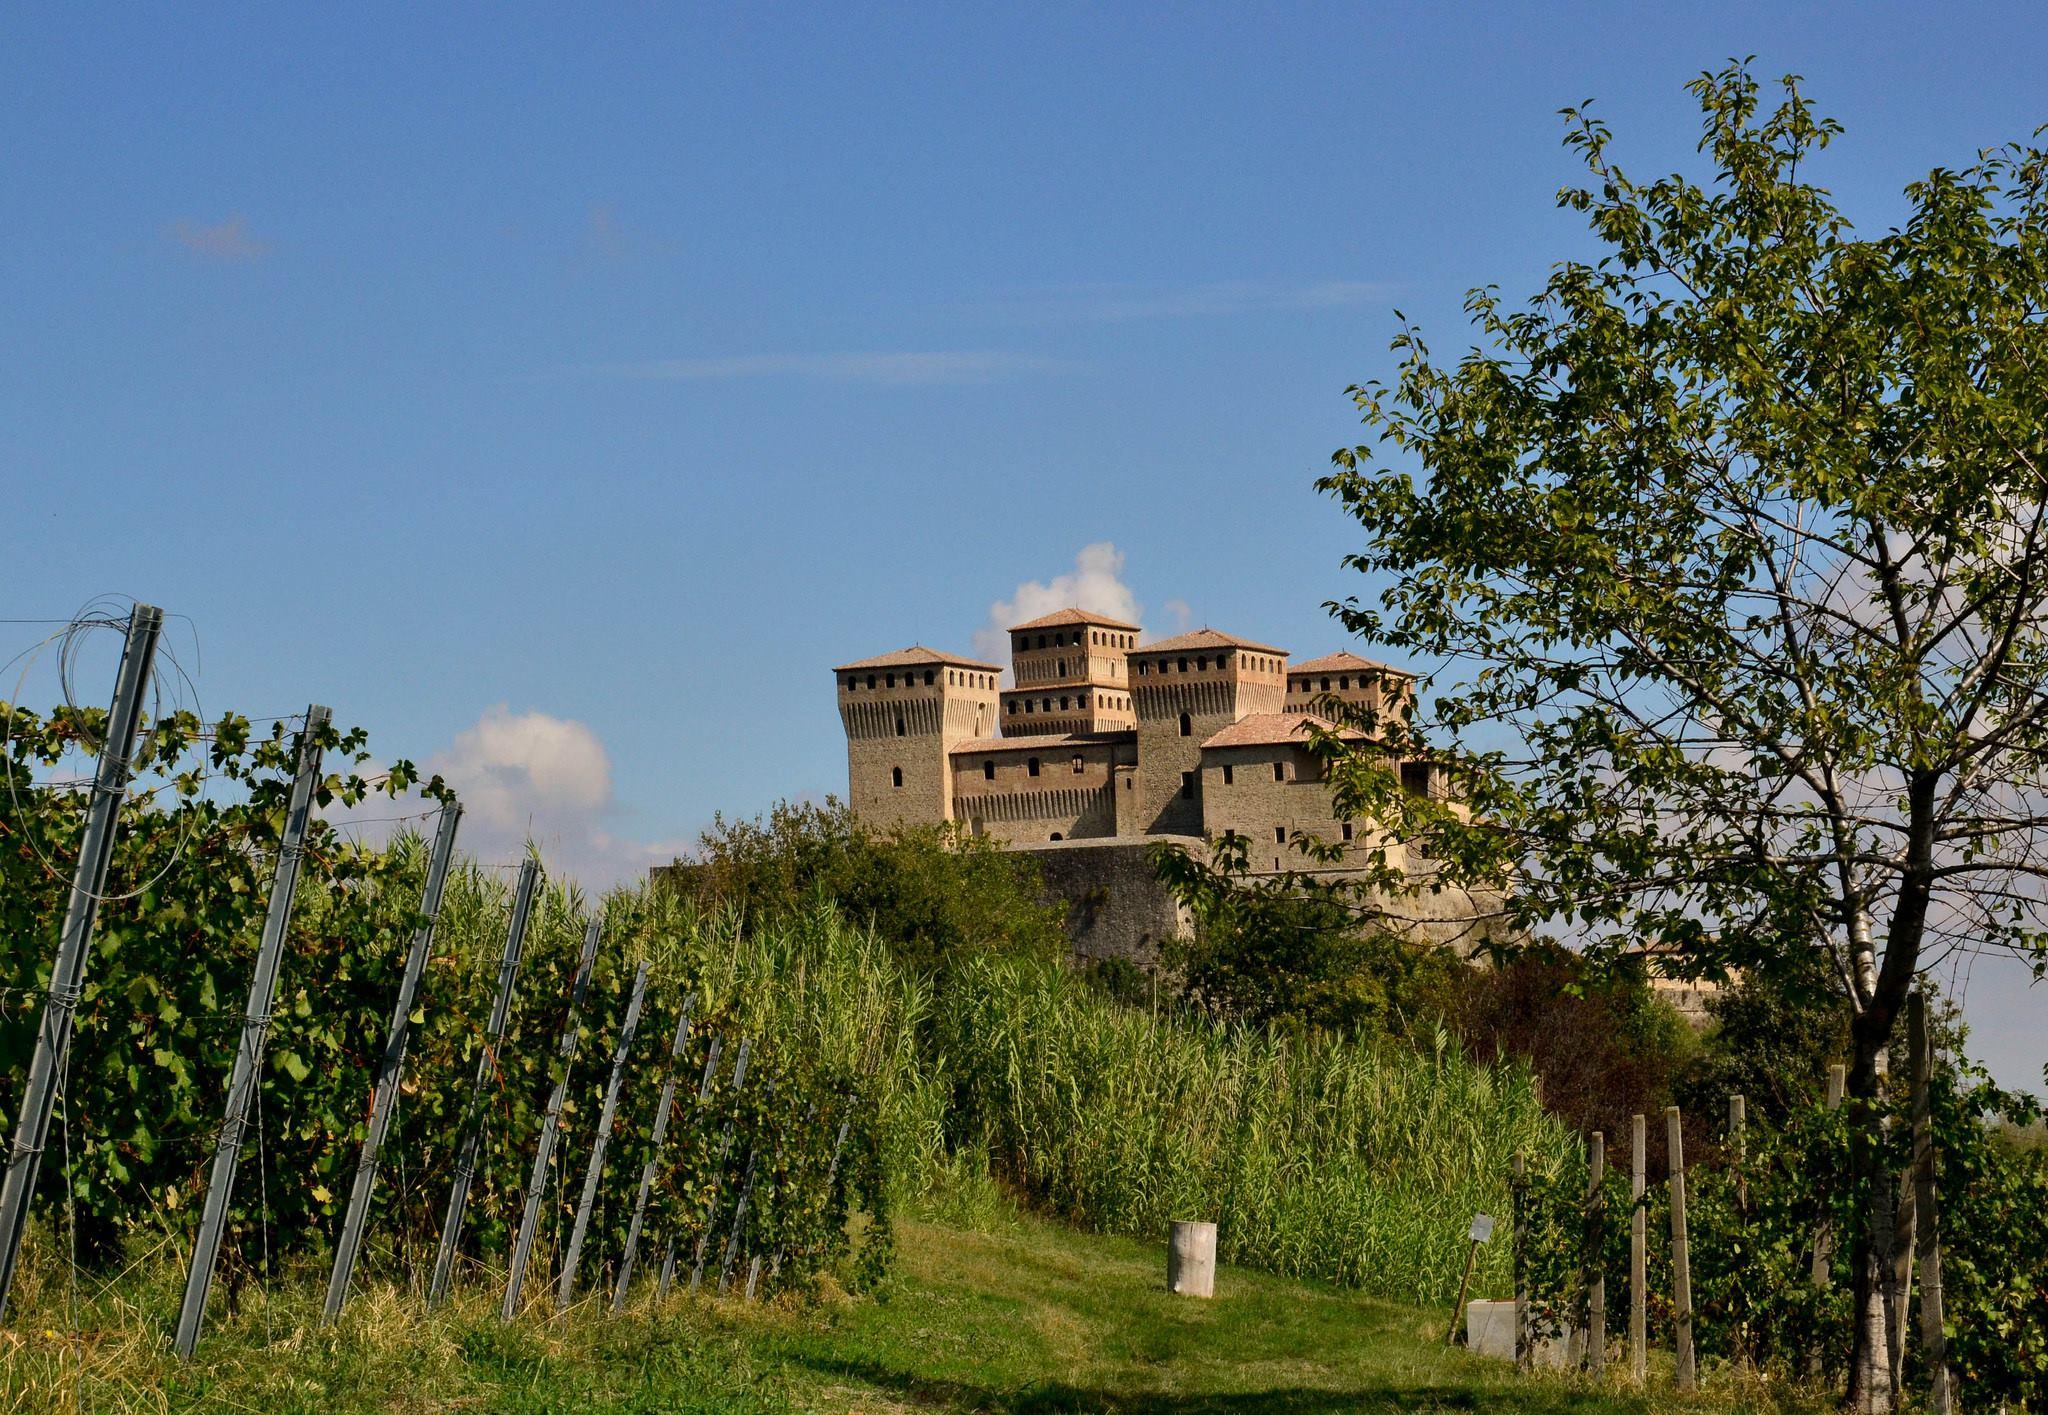 Parma's Malvasia, vineyards and castles - Ph. Parma City of Gastronomy